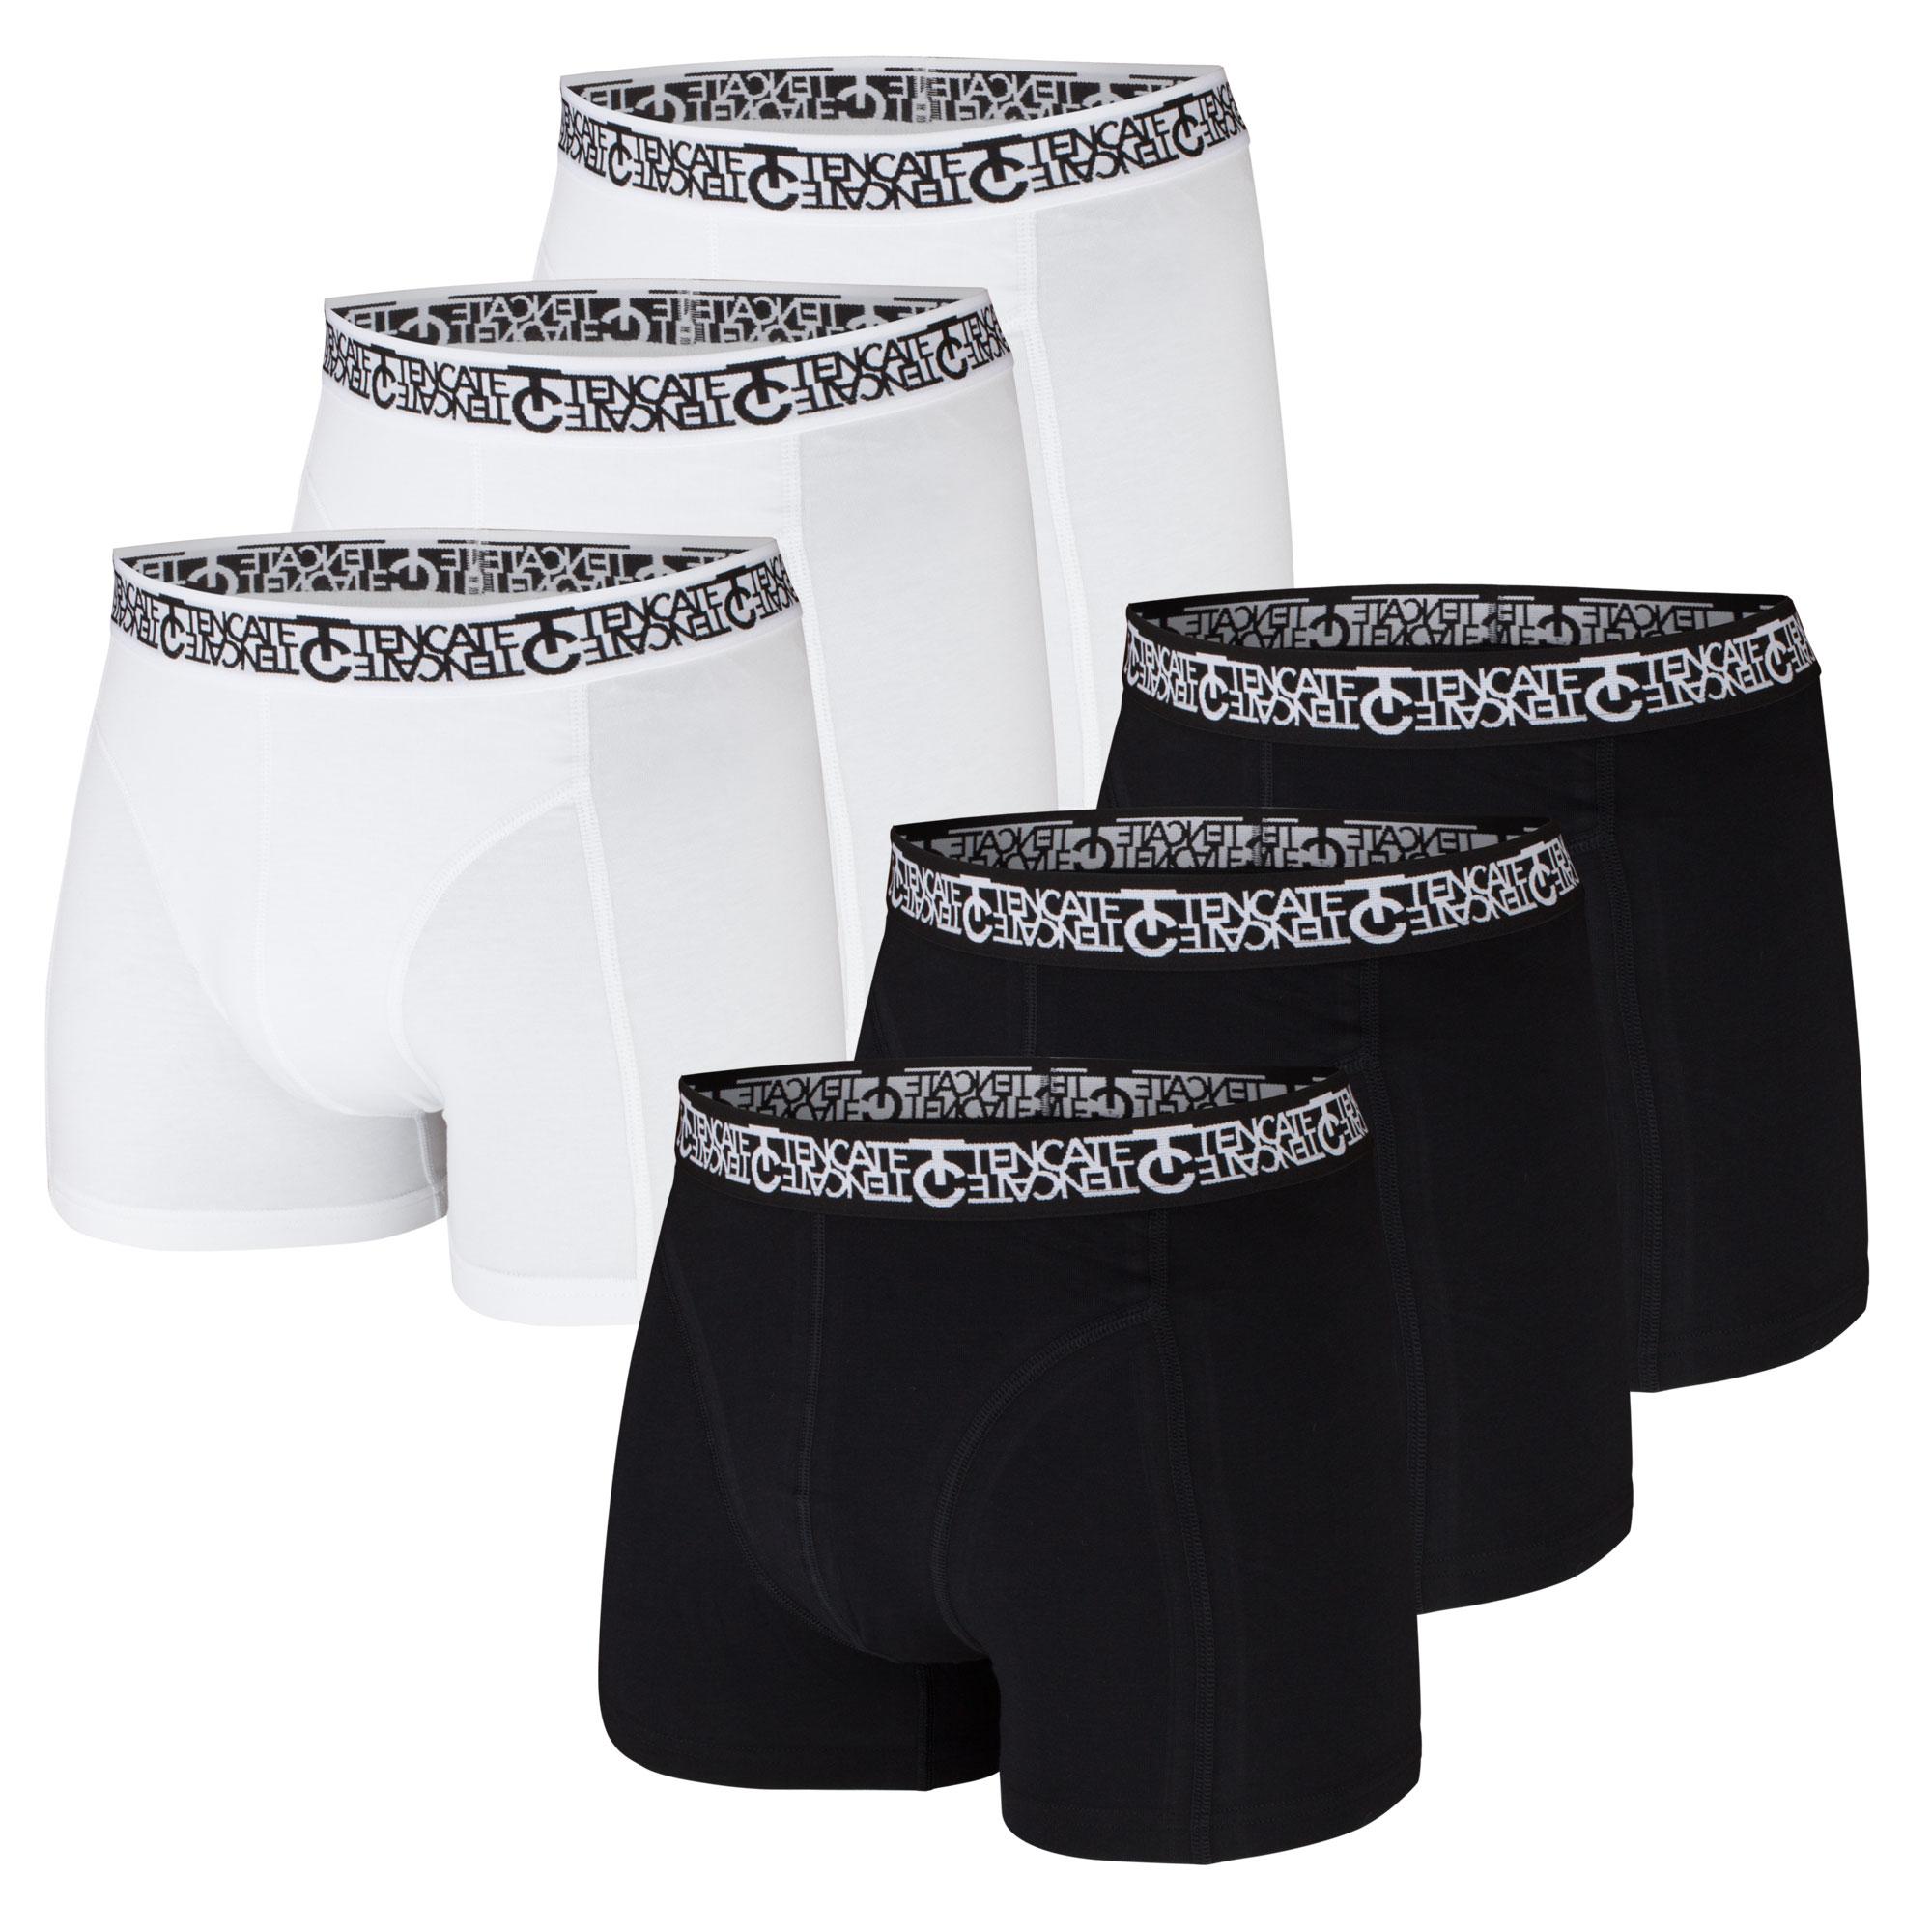 Ten Cate 3er Pack Herren Boxershorts, Shorts – Bild 1